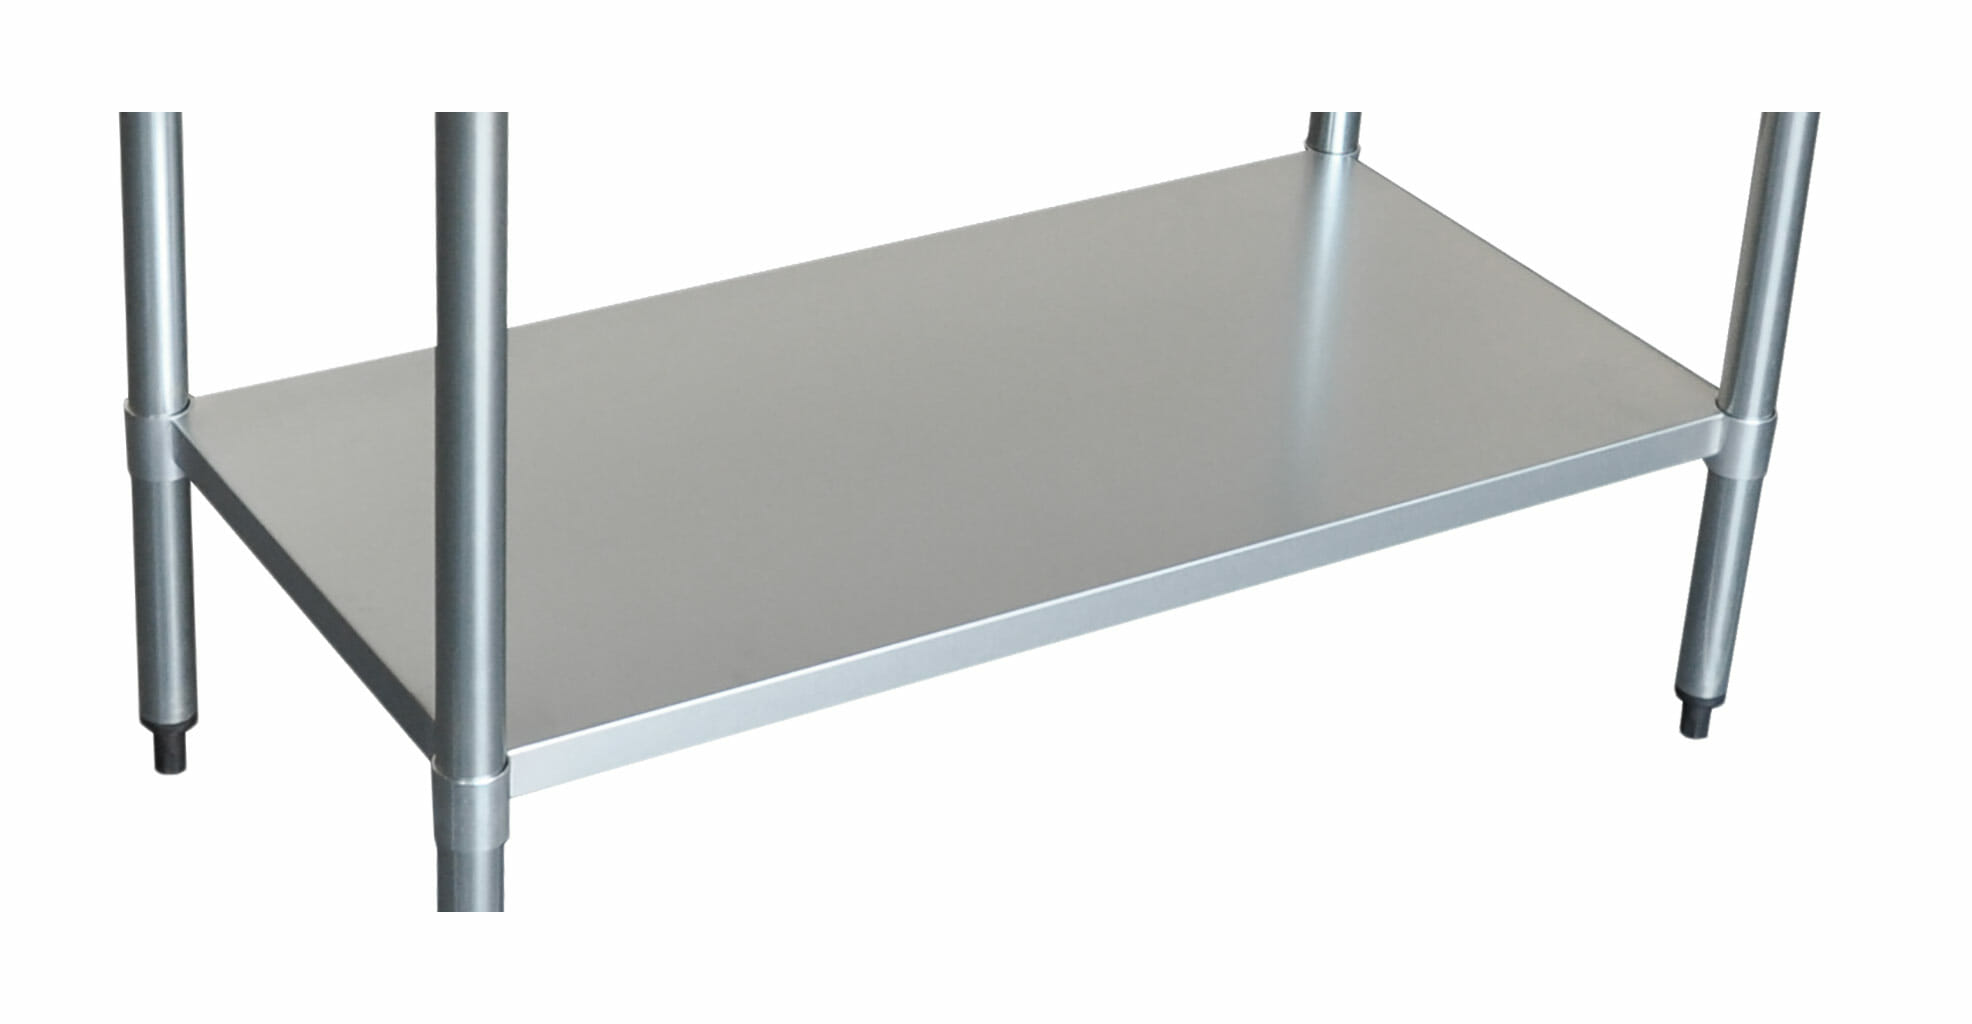 Stainless Undershelf for 2424 Bench